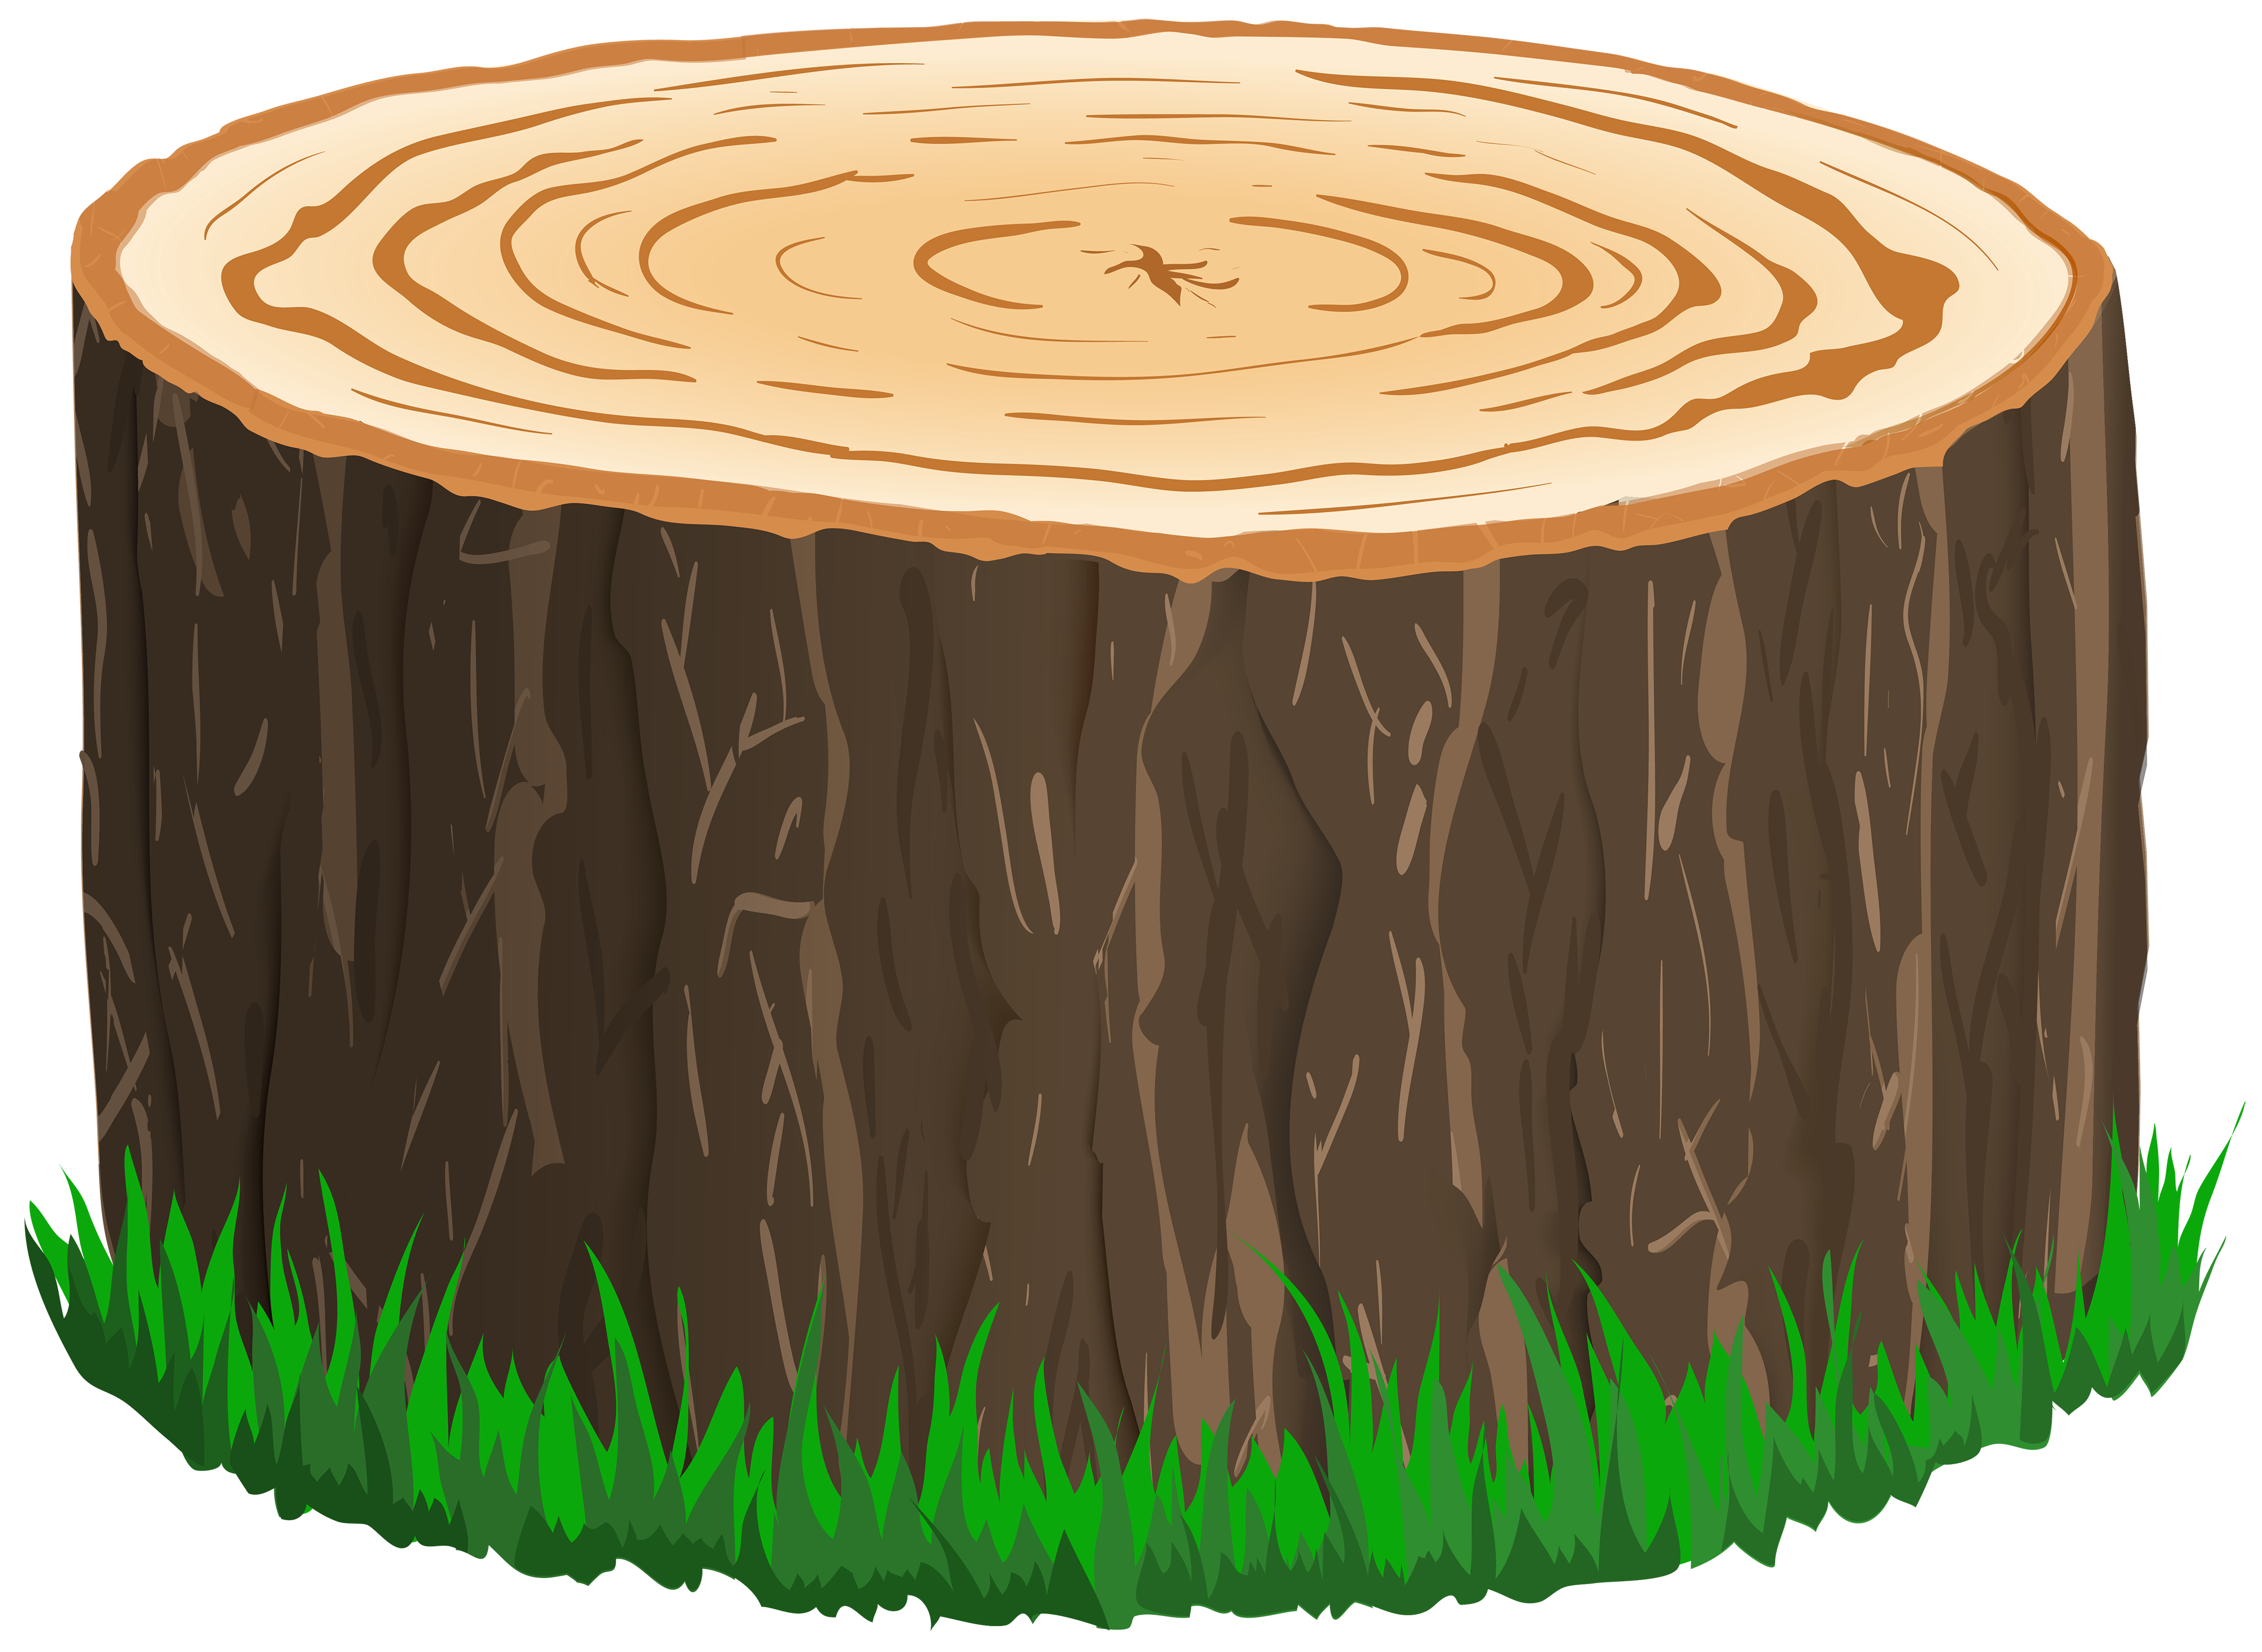 Tree clipart circle. Stump image gallery yopriceville